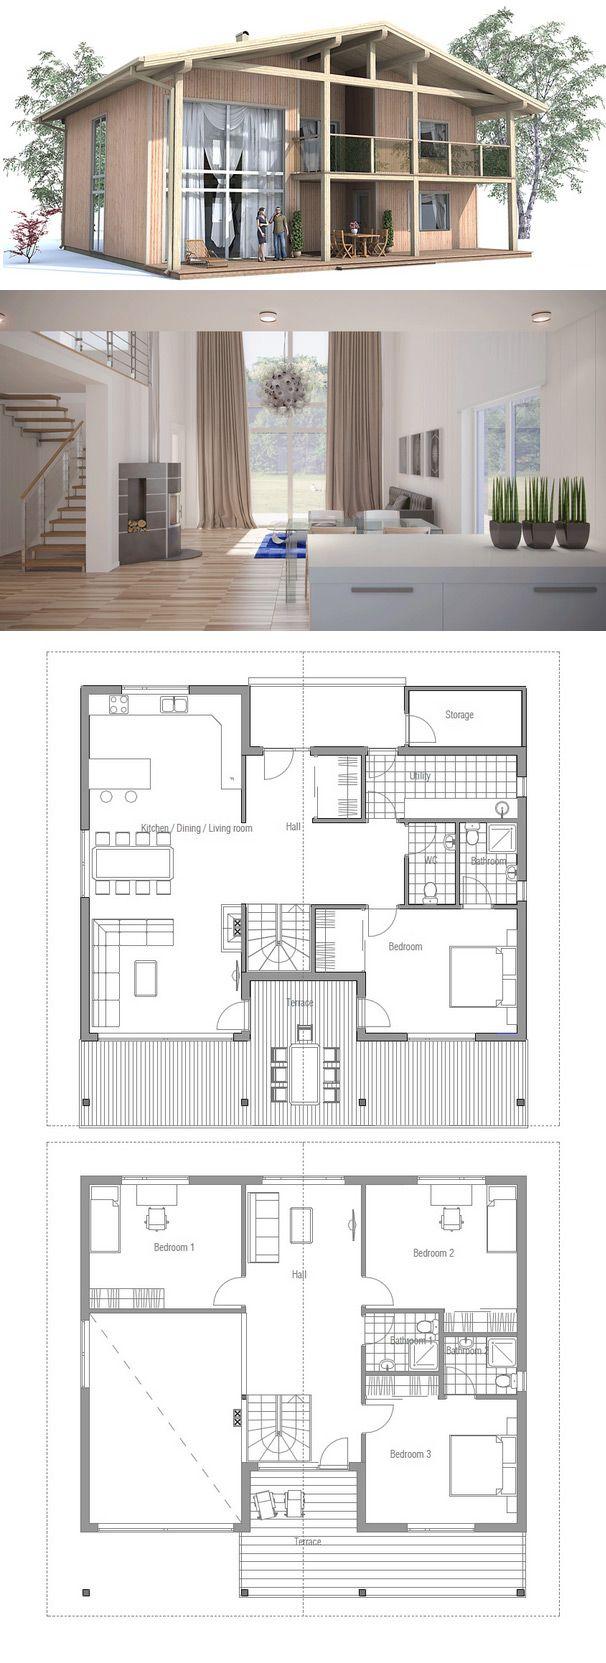 17 best ideas about elevator on pinterest elevator design elevator lobby and lobbies. Black Bedroom Furniture Sets. Home Design Ideas